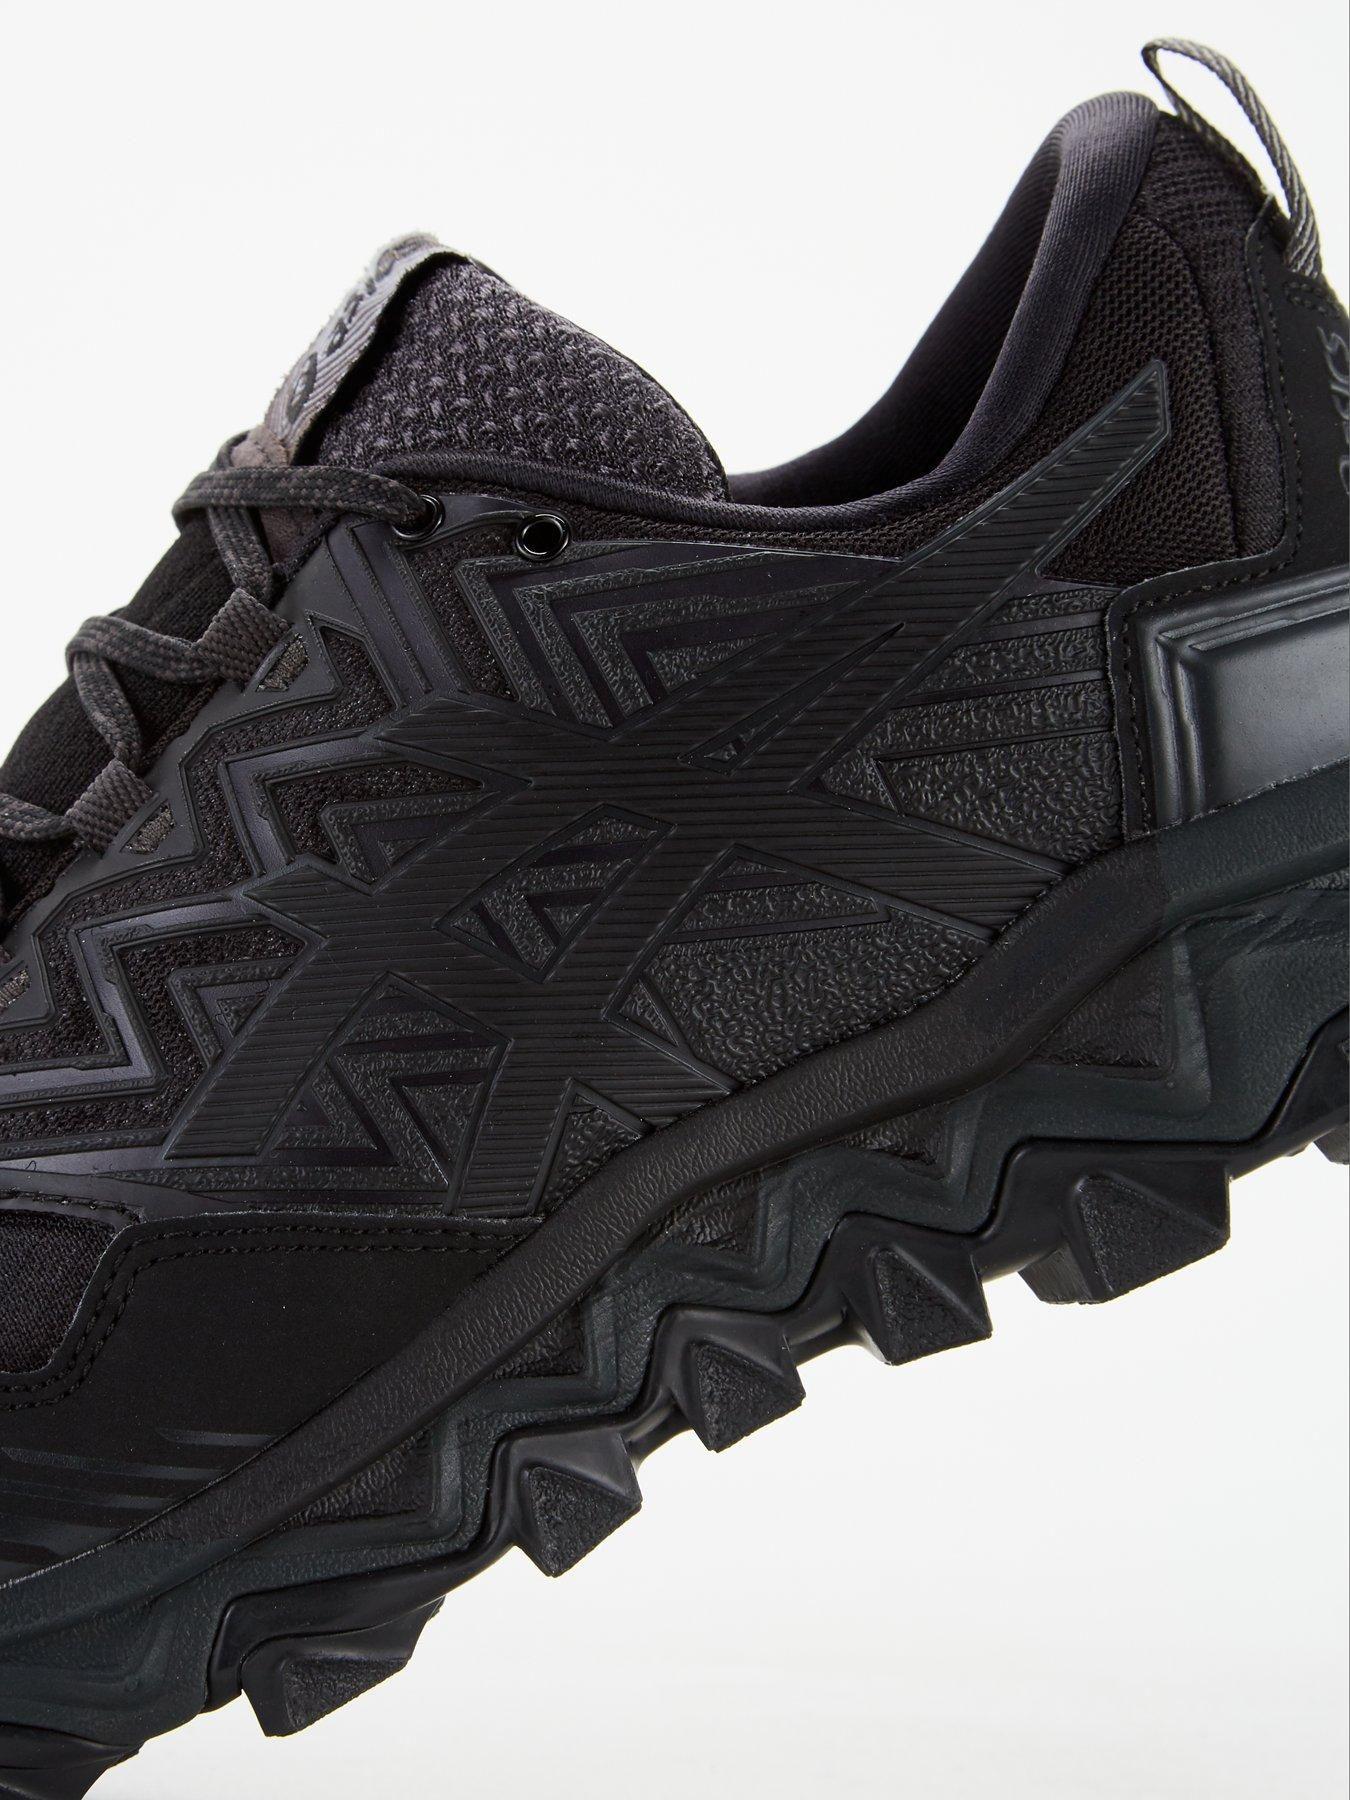 Asics Asics Gel Fujitrabuco 8 Gore Tex, BlackBlack, Size